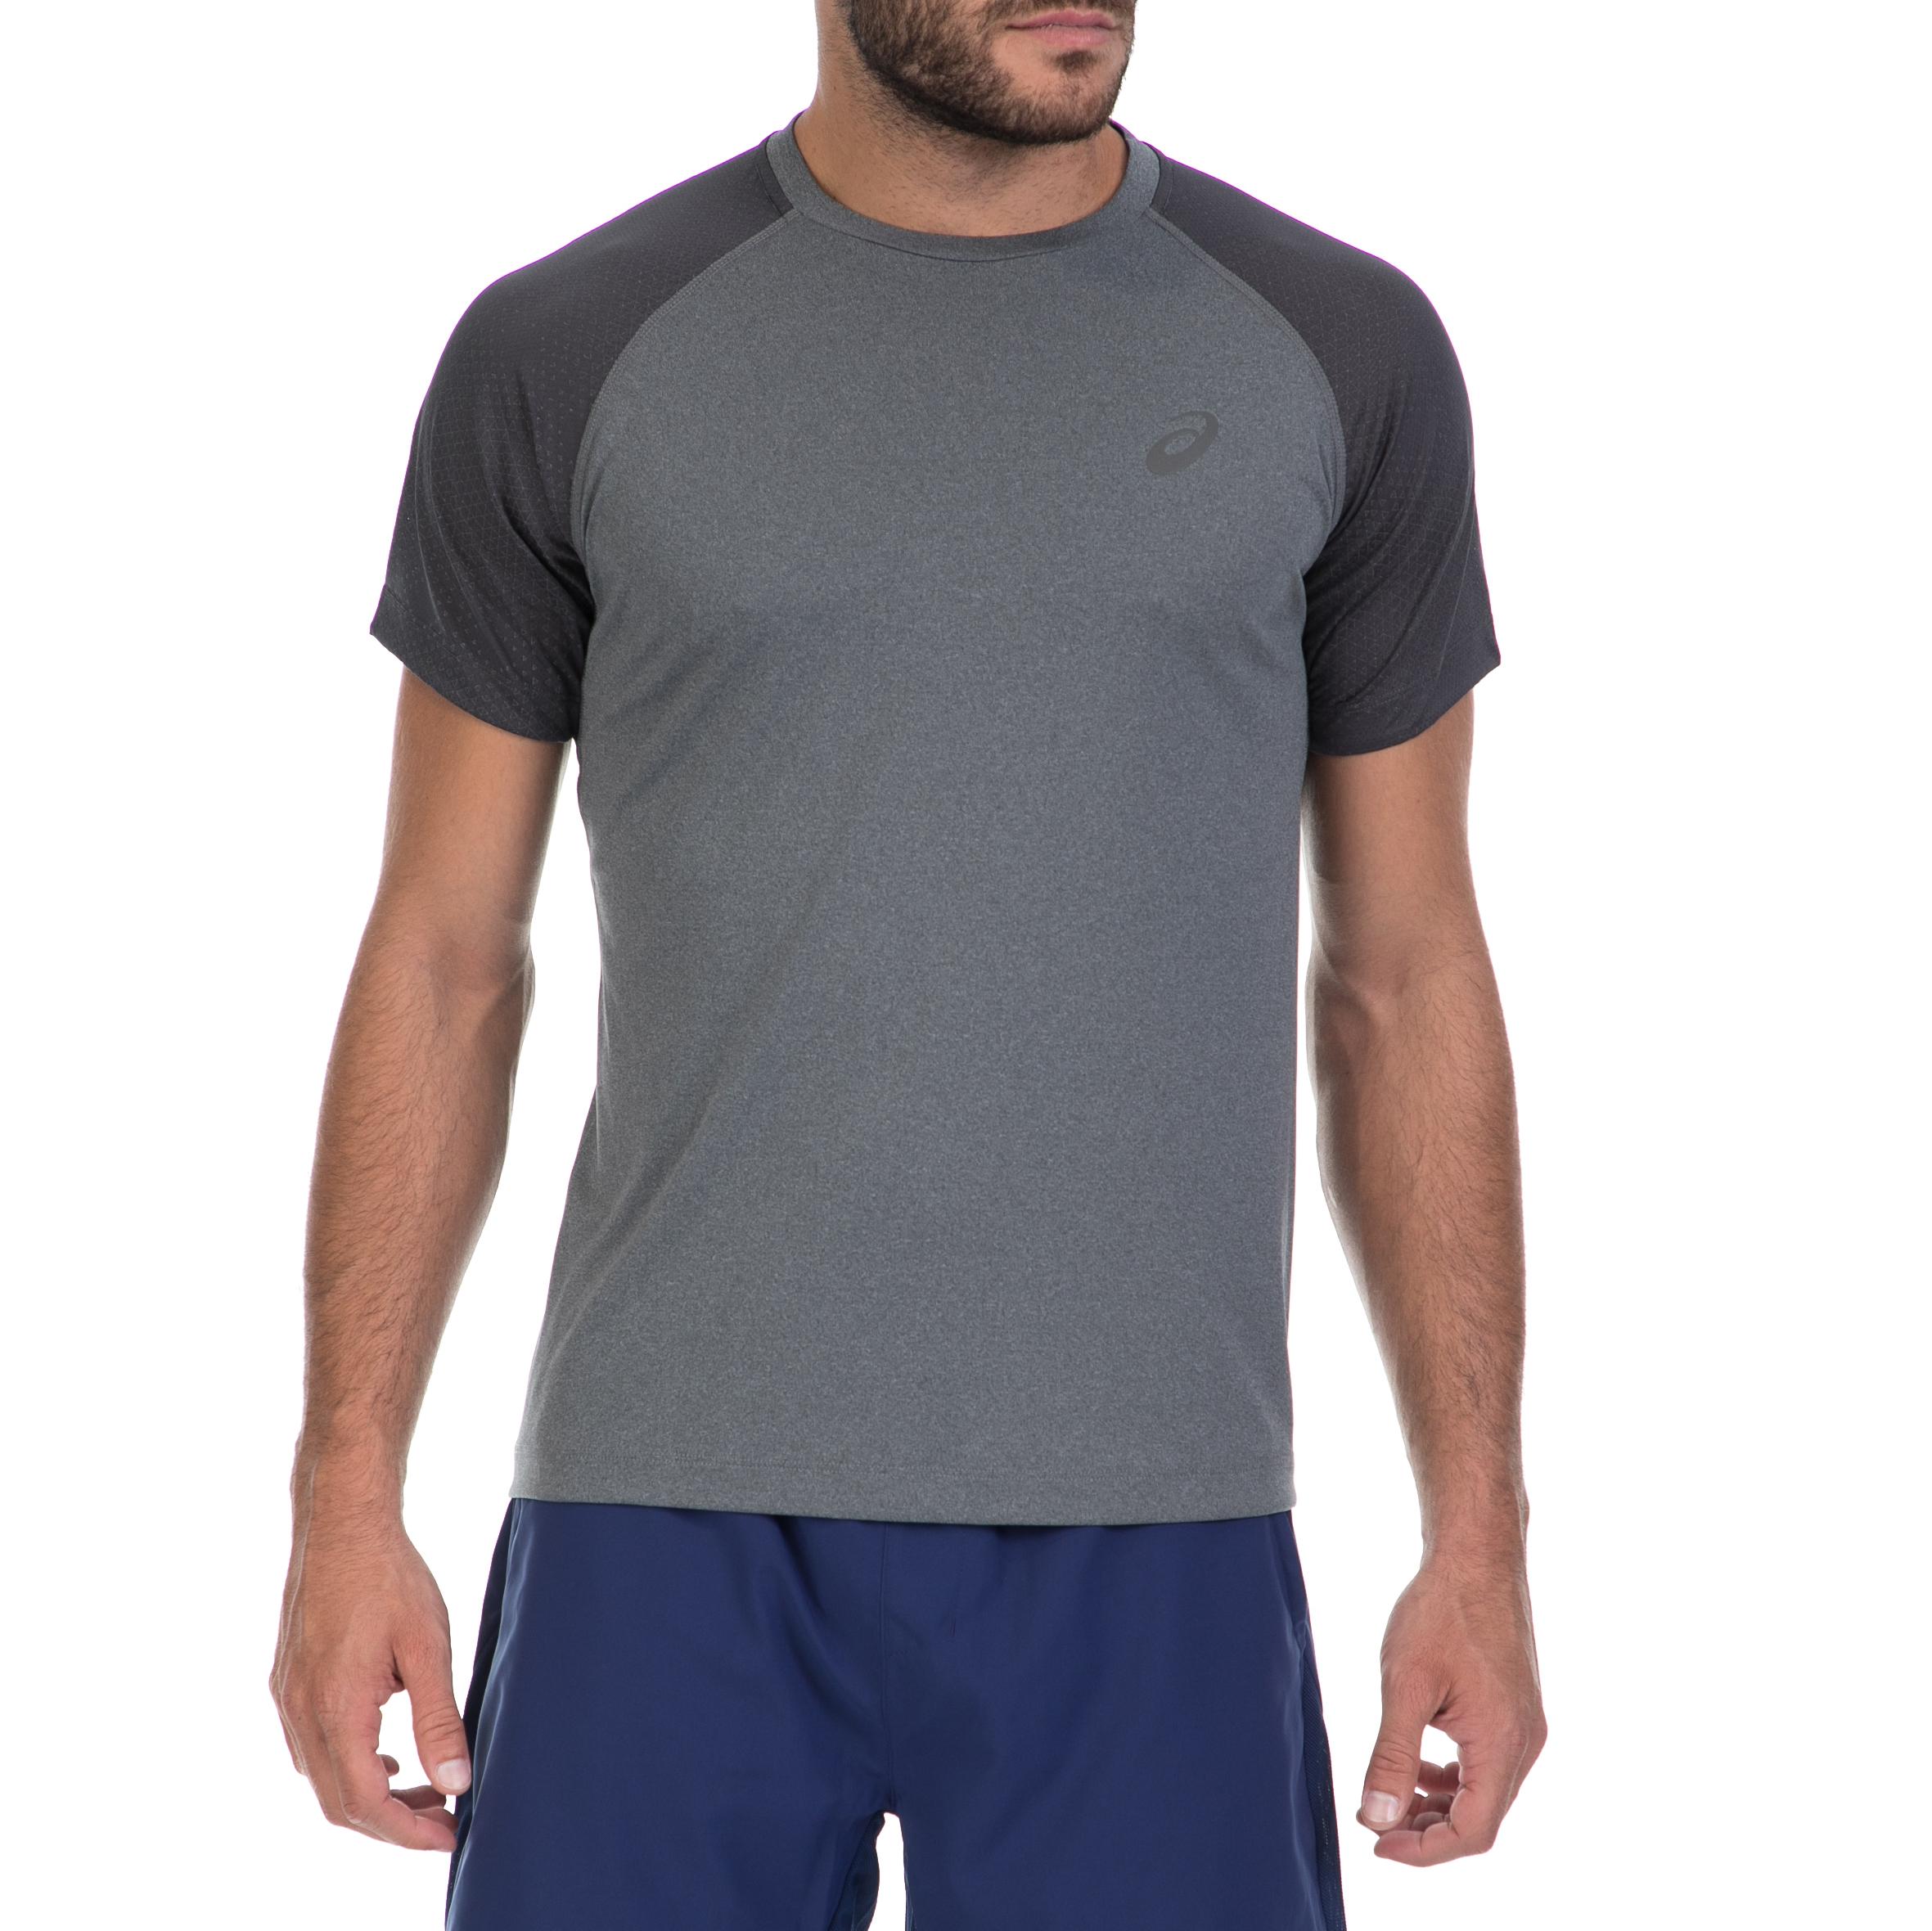 ASICS - Αντρική μπλούζα ASICS γκρι ανδρικά ρούχα αθλητικά t shirt